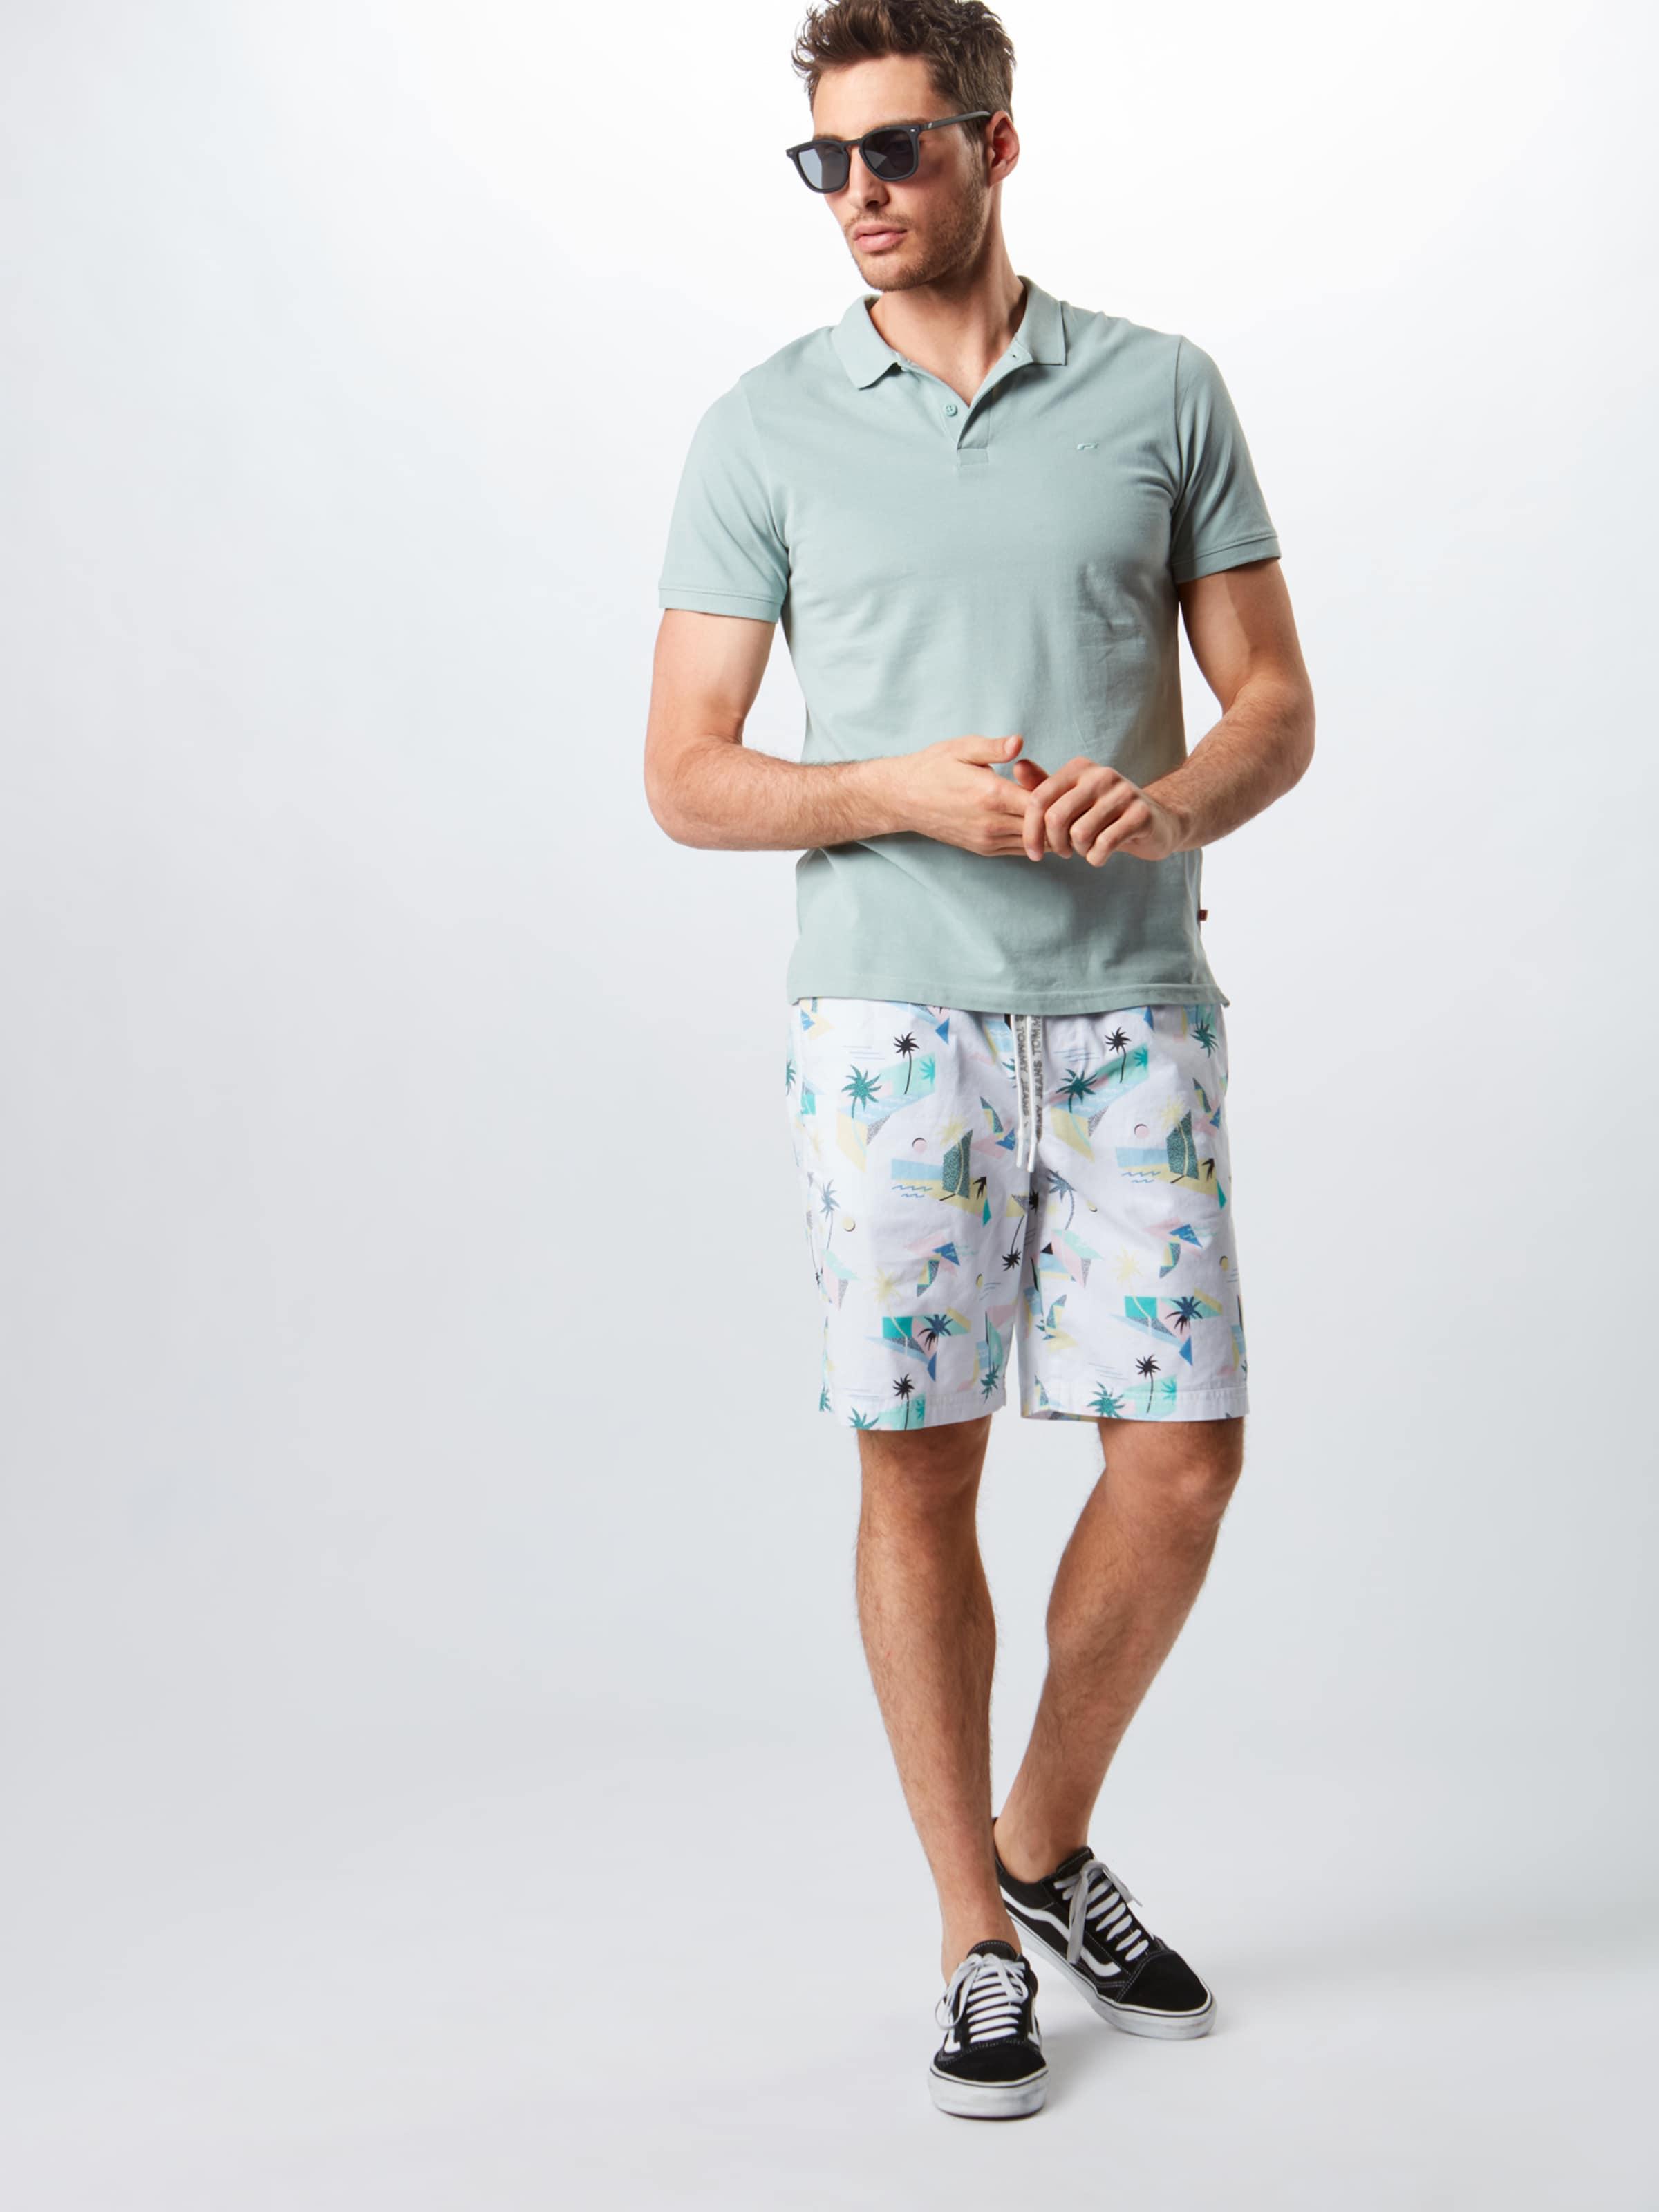 Seasonal In Jeans Tommy Shorts Short' 'tjm Prints MischfarbenWeiß j35ARL4